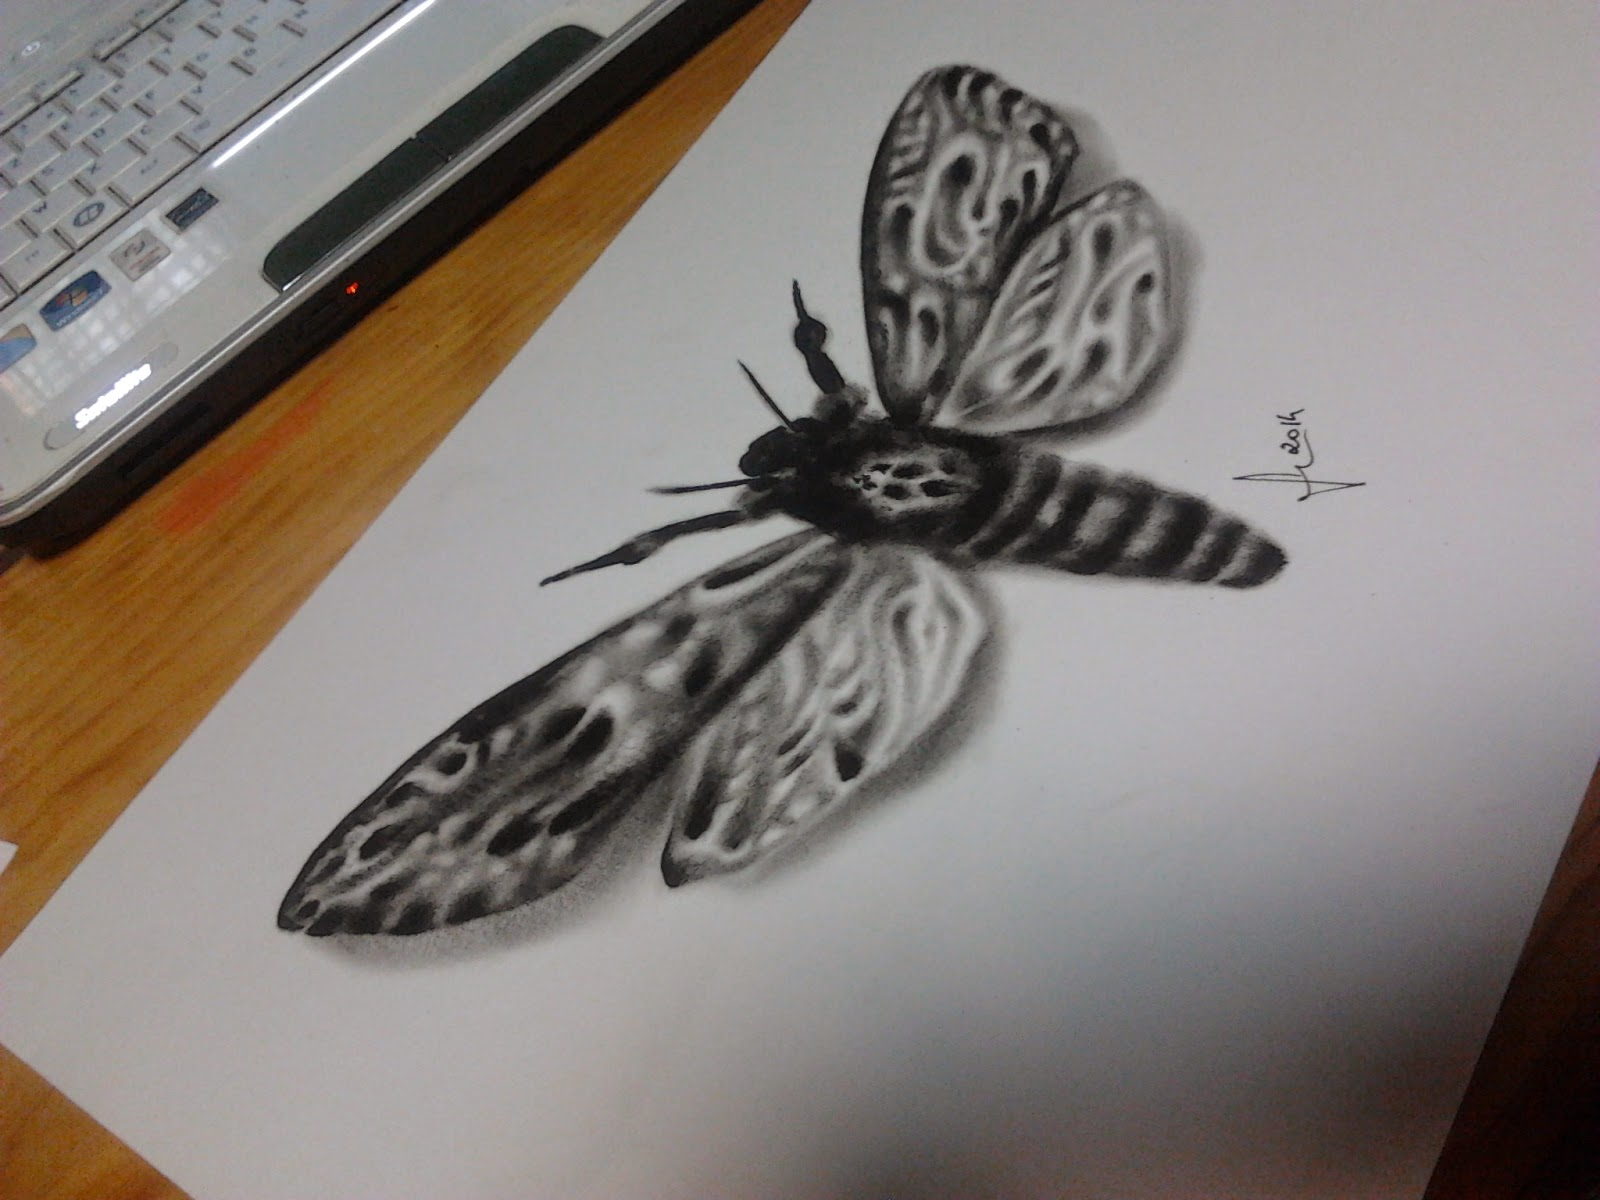 esboço para tatuagem em drybrush e caneta preta - borboleta inspirada no silêncio dos inocentes / Butterfly inspired on Silence of the lambs handmade in drybrush and black pen